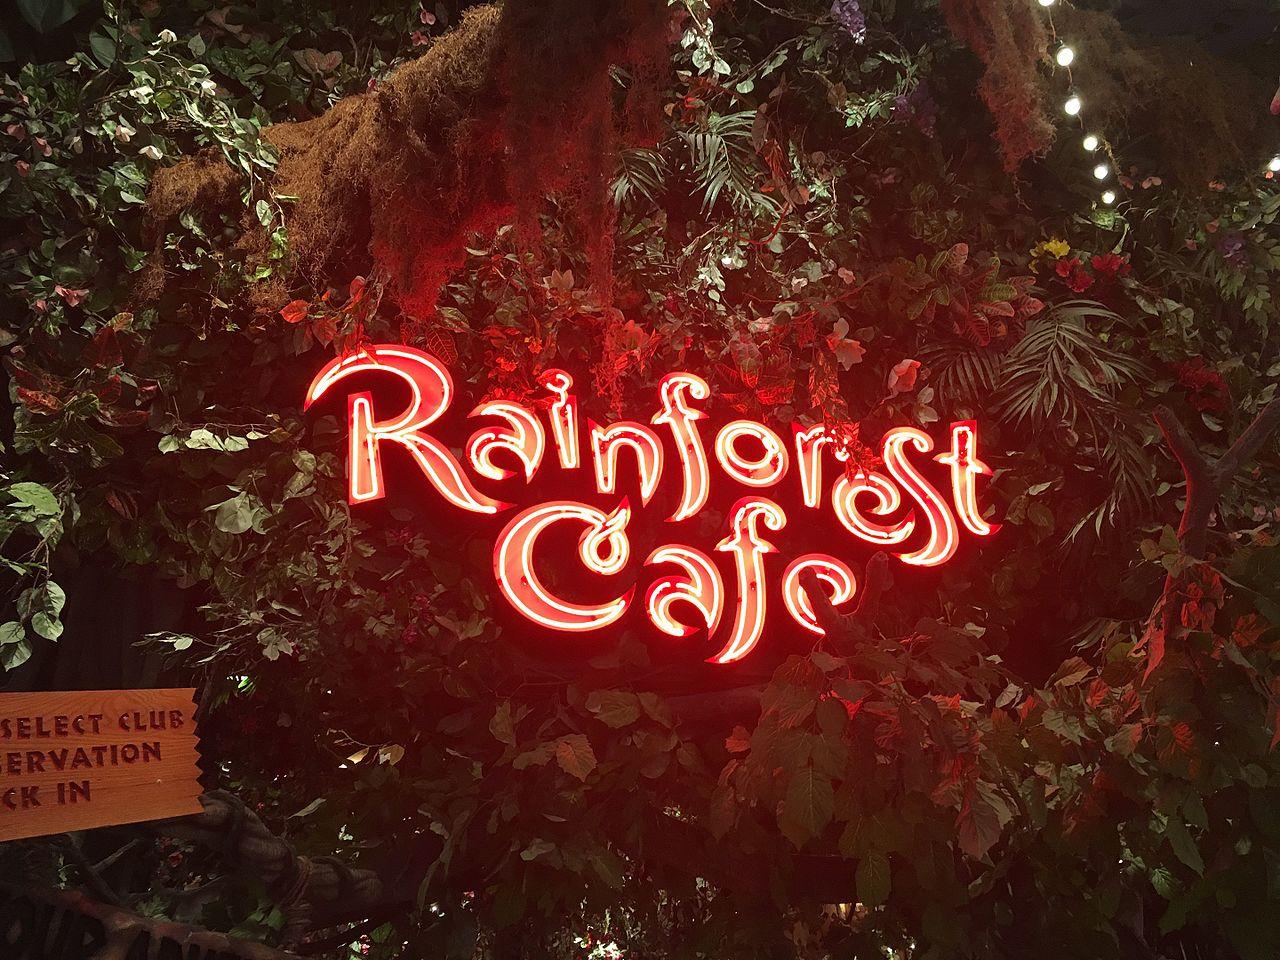 Rainforest Cafe Auburn Hills Mi Menu Prices